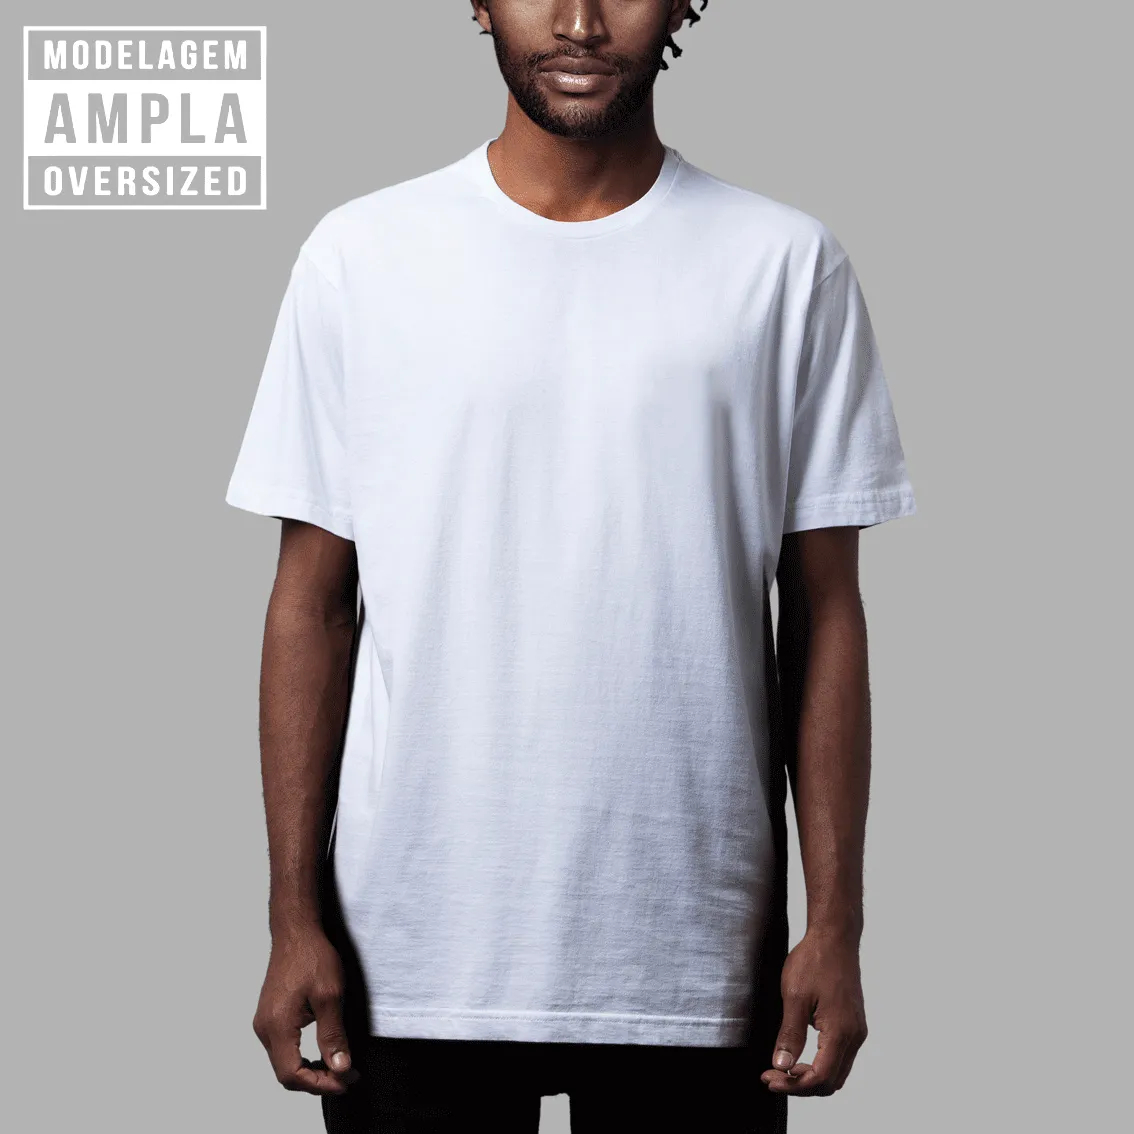 Camiseta Básica Oversized Branca